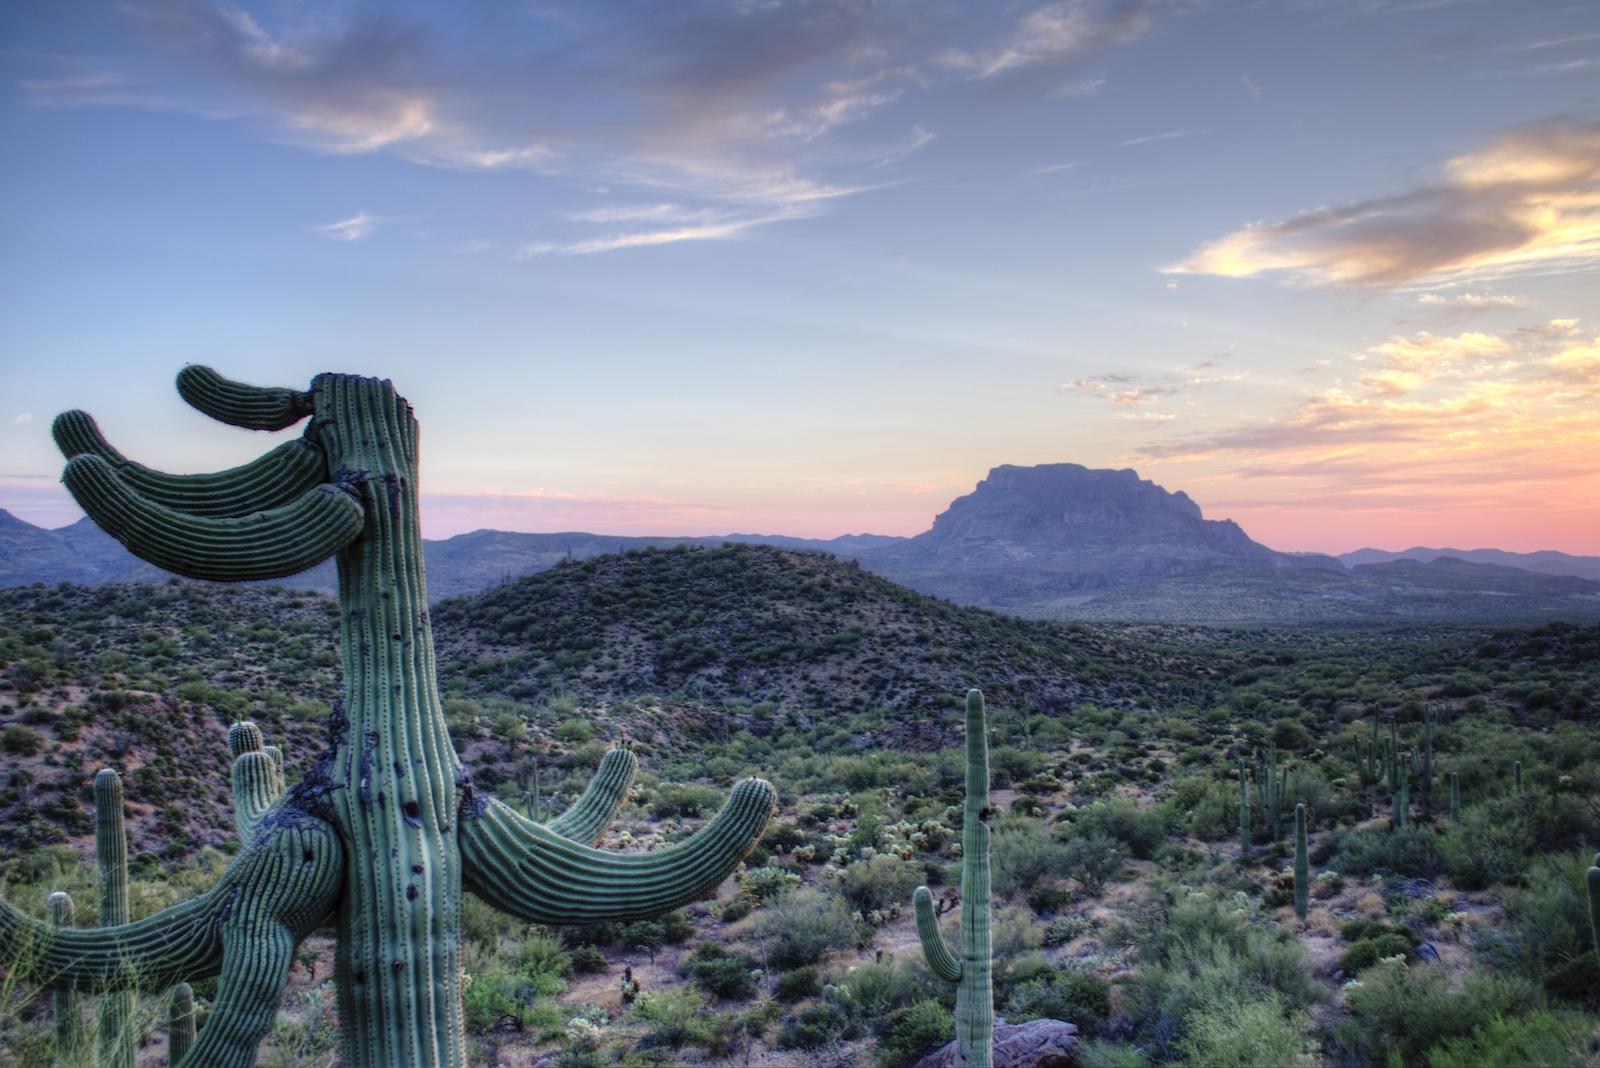 Sunset with mountain and saguaro cactus in Superior, Arizona